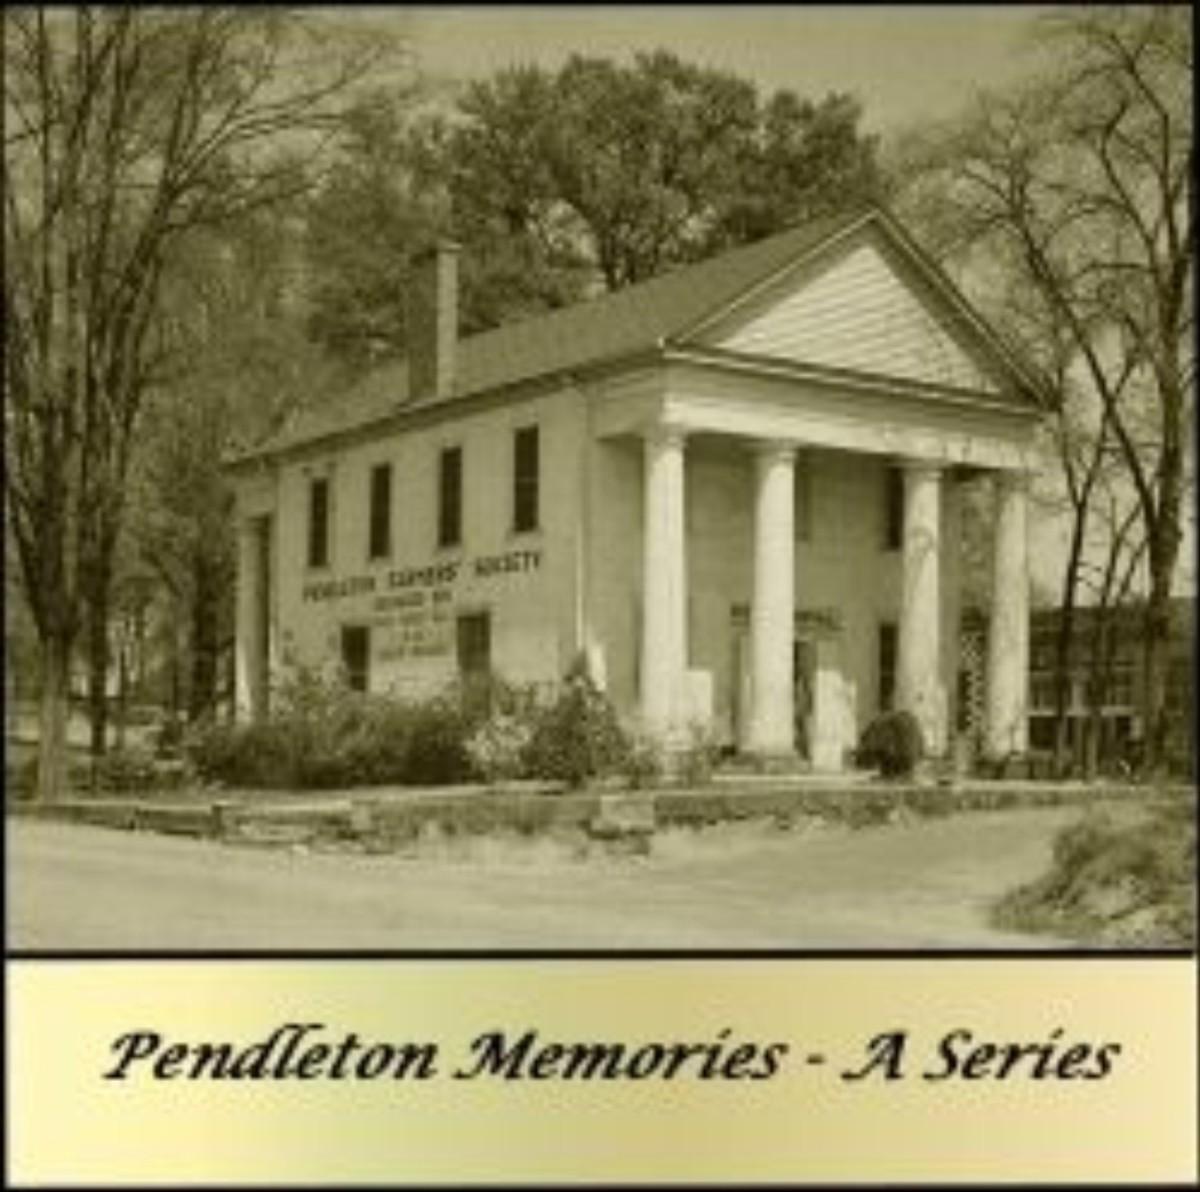 pendleton-memories